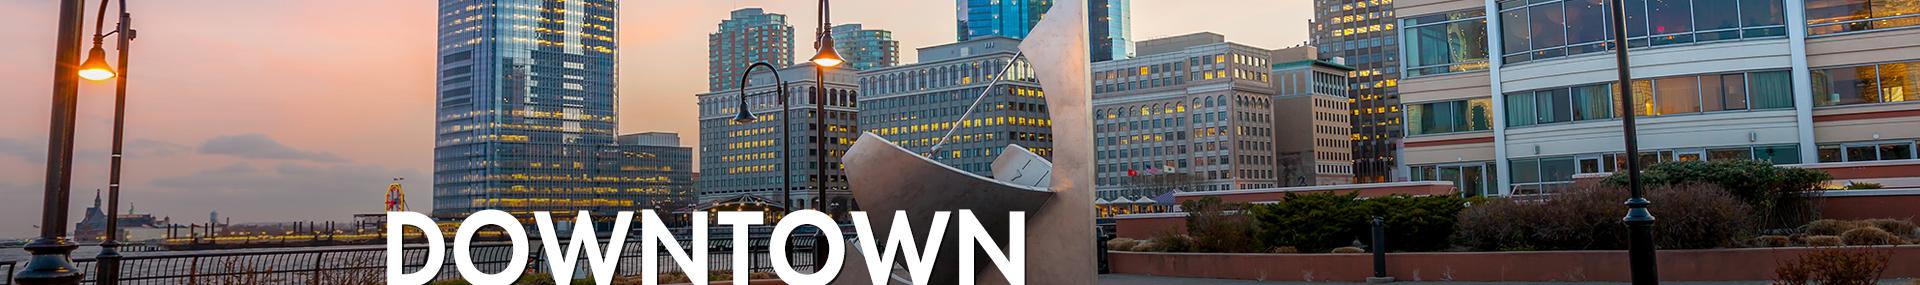 jcr-downtown-banner